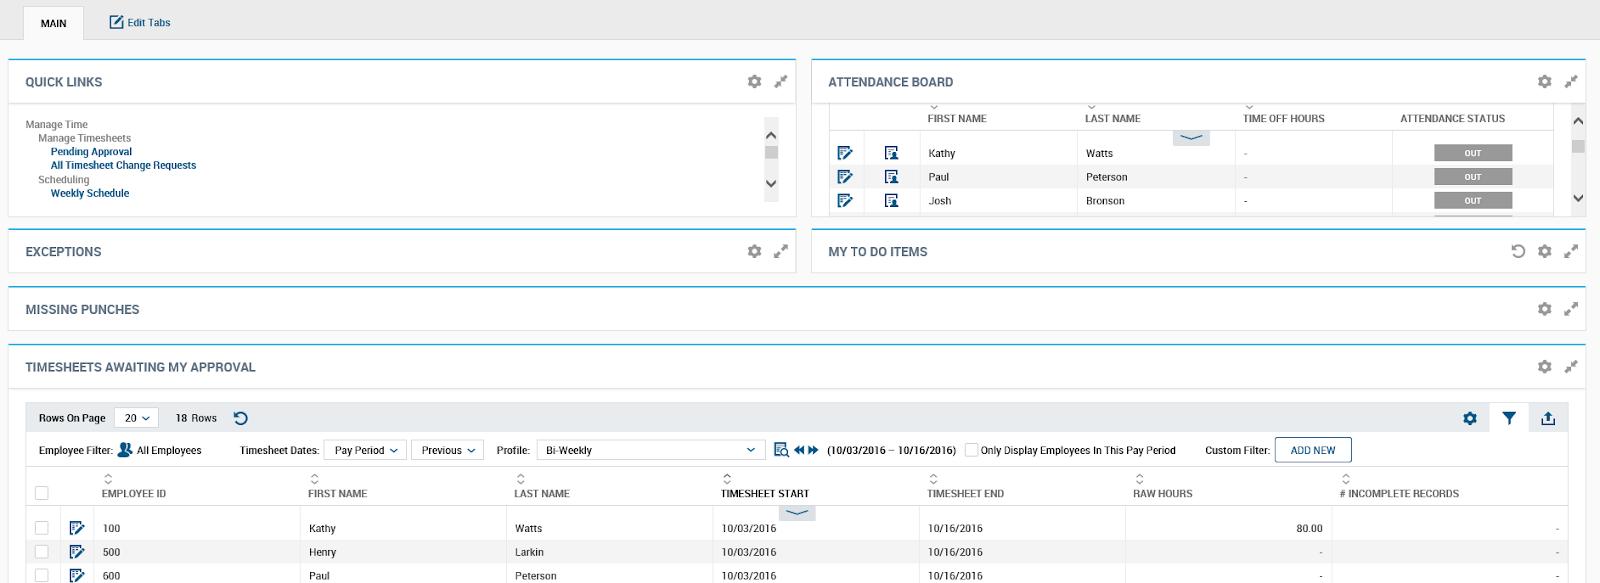 Kronos Workforce Ready Manager Dashboard Screenshot